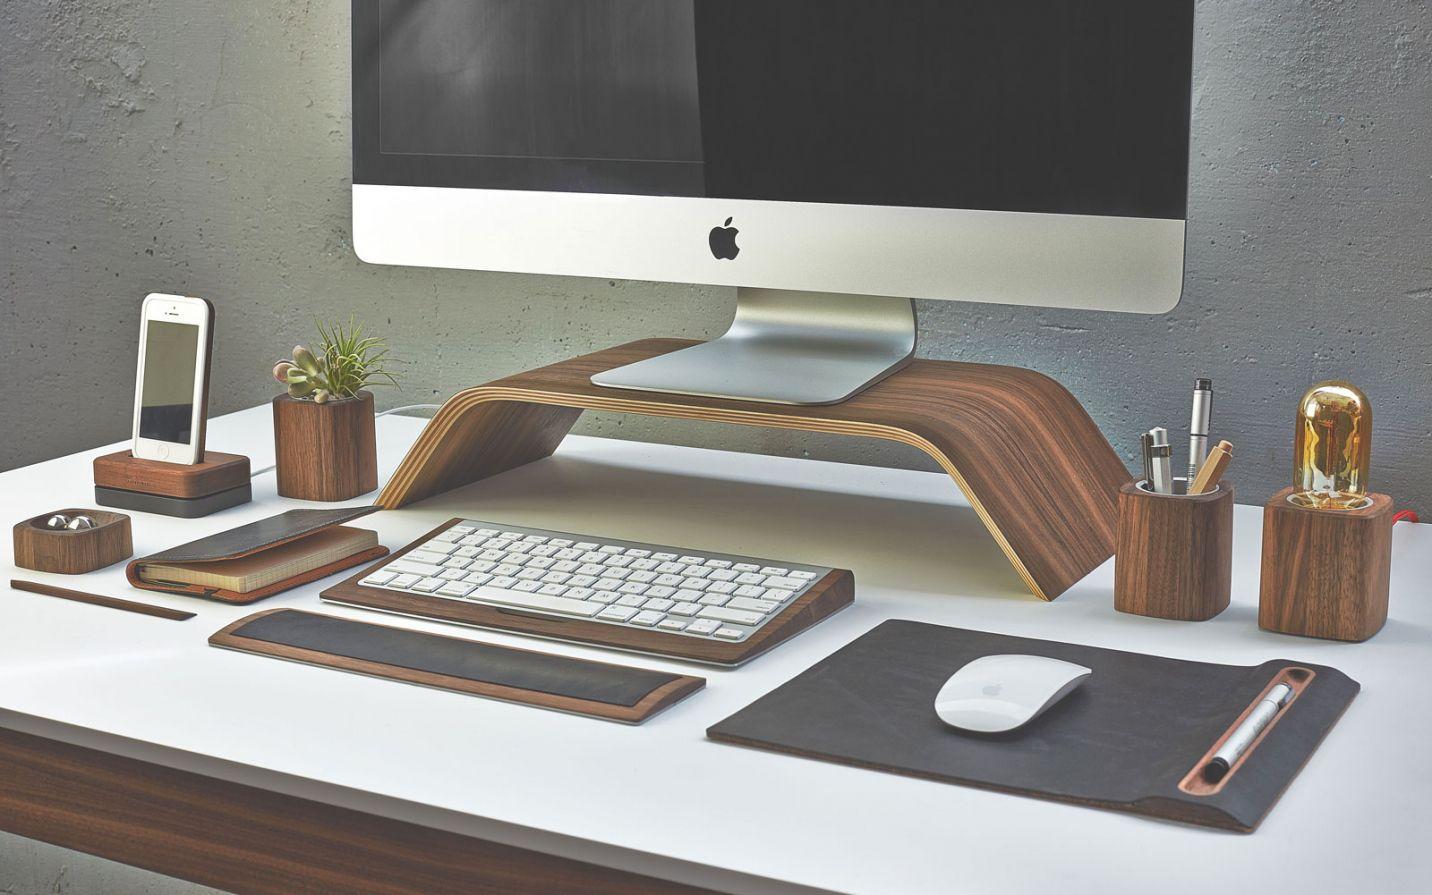 Apple Desk Accessories Ashley Furniture Home Office Check More At Http Michael Malarkey Com Apple Desk Accessories Desain Produk Dekorasi Rumah Minimalis